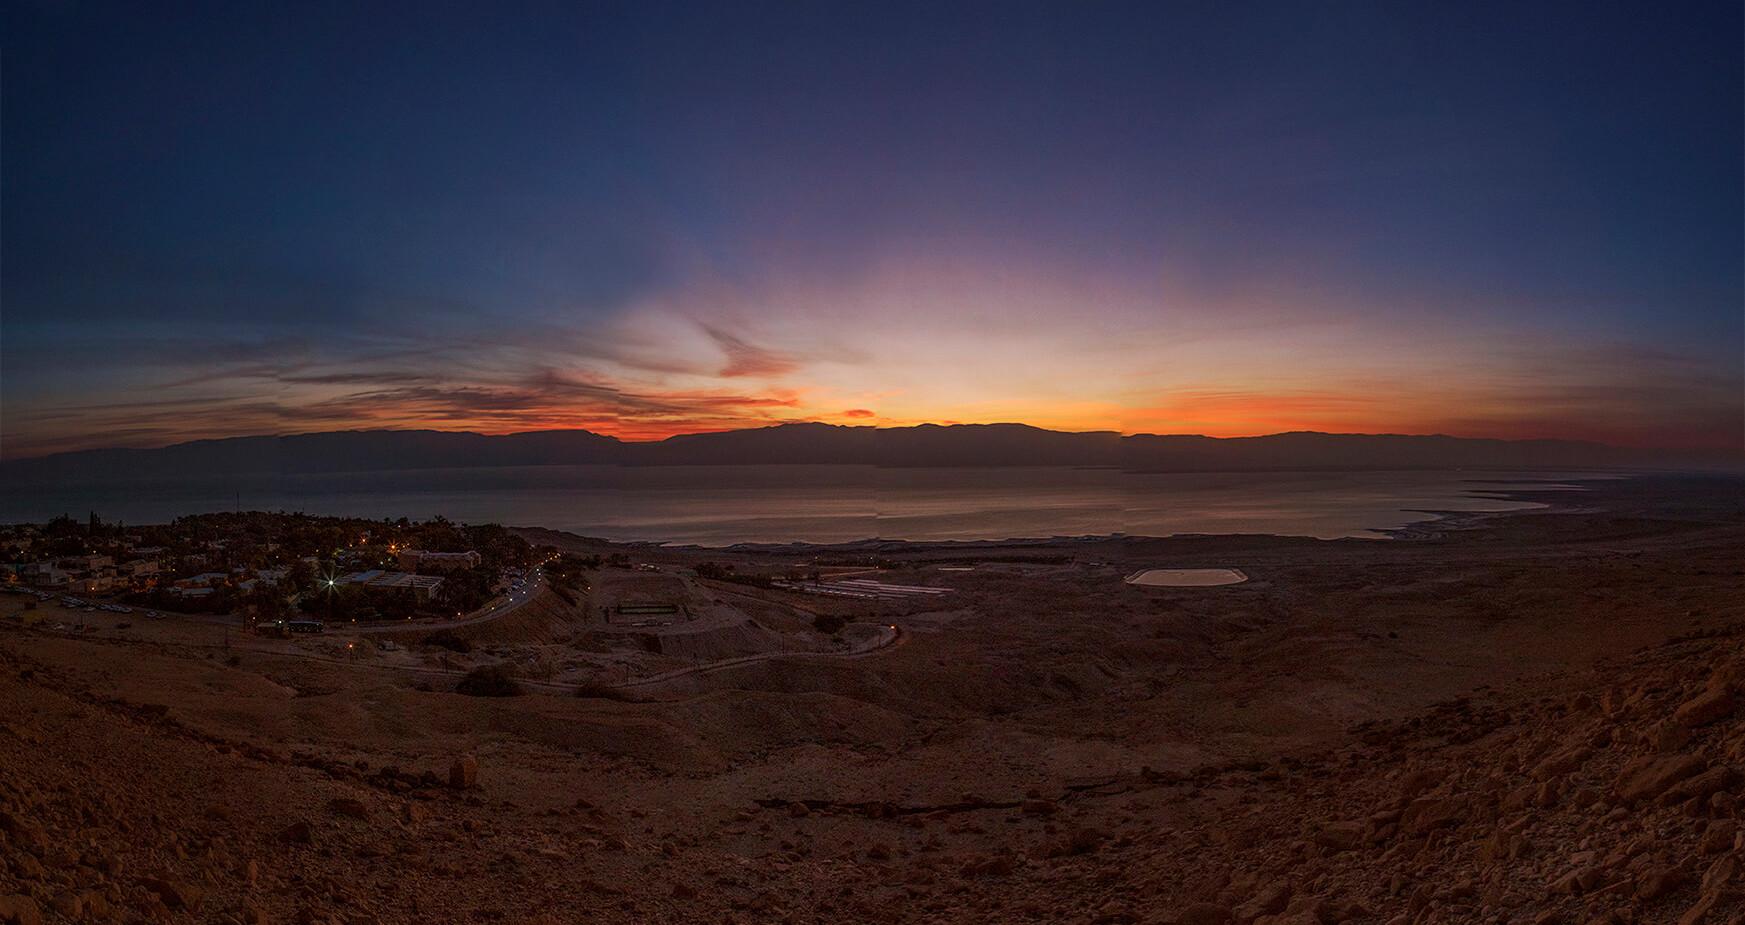 Sunrise over the Dead Sea.jpg